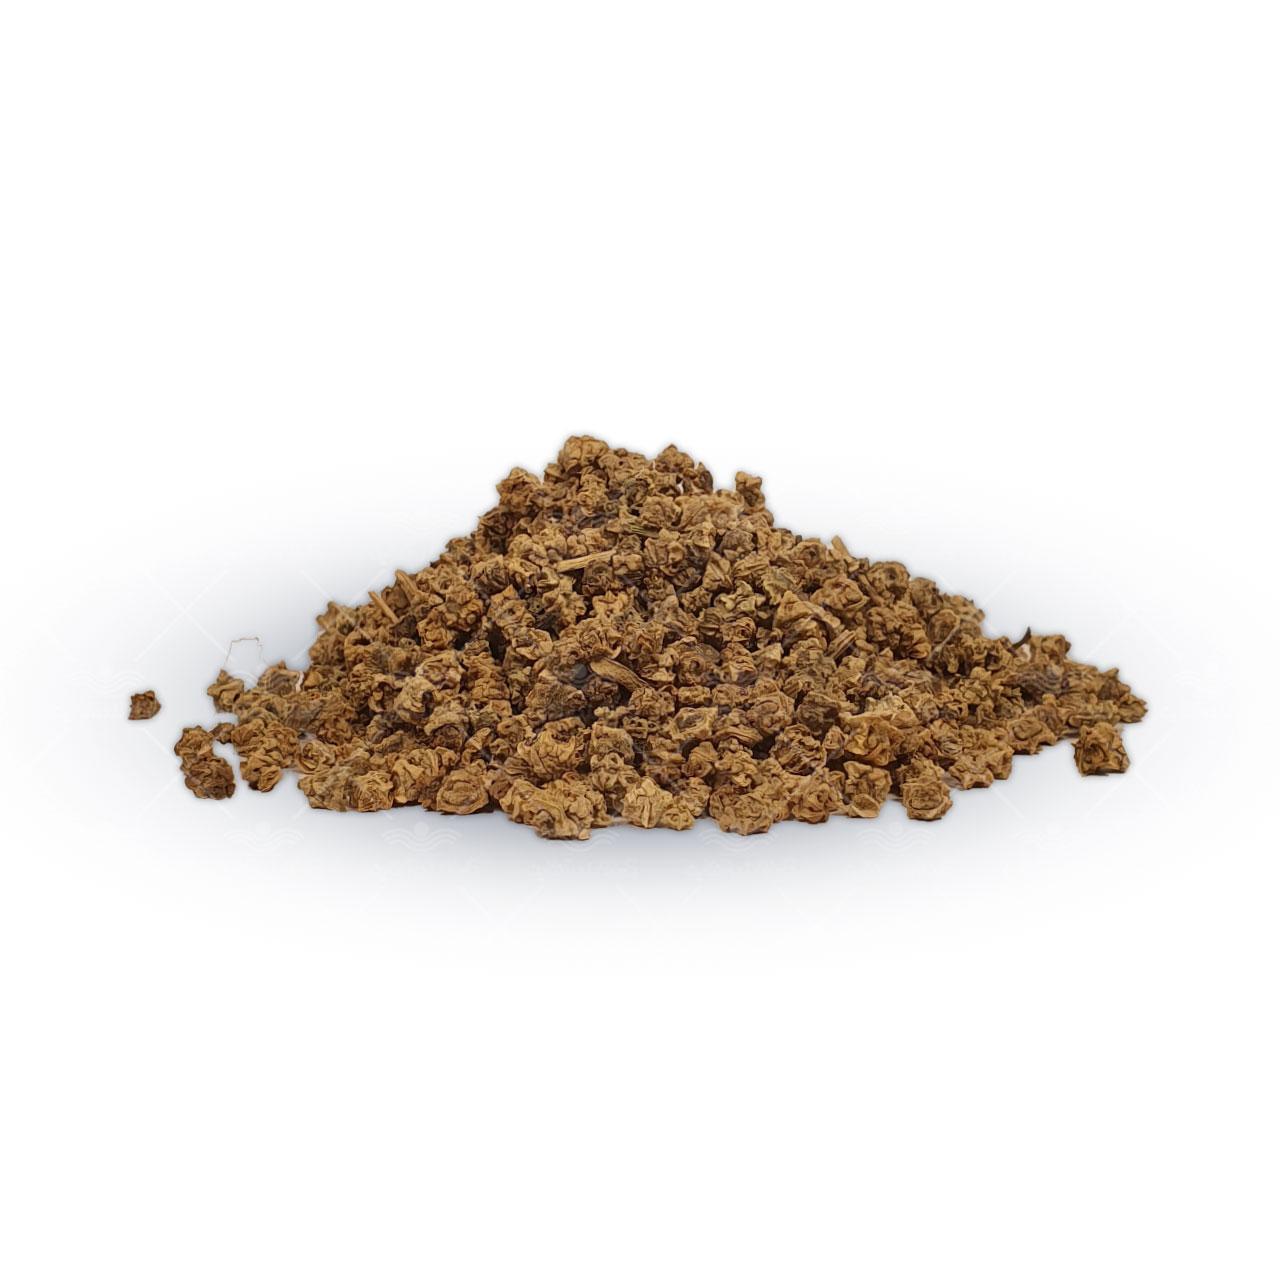 بذر چغندر قند نیم کیلویی ایرانی